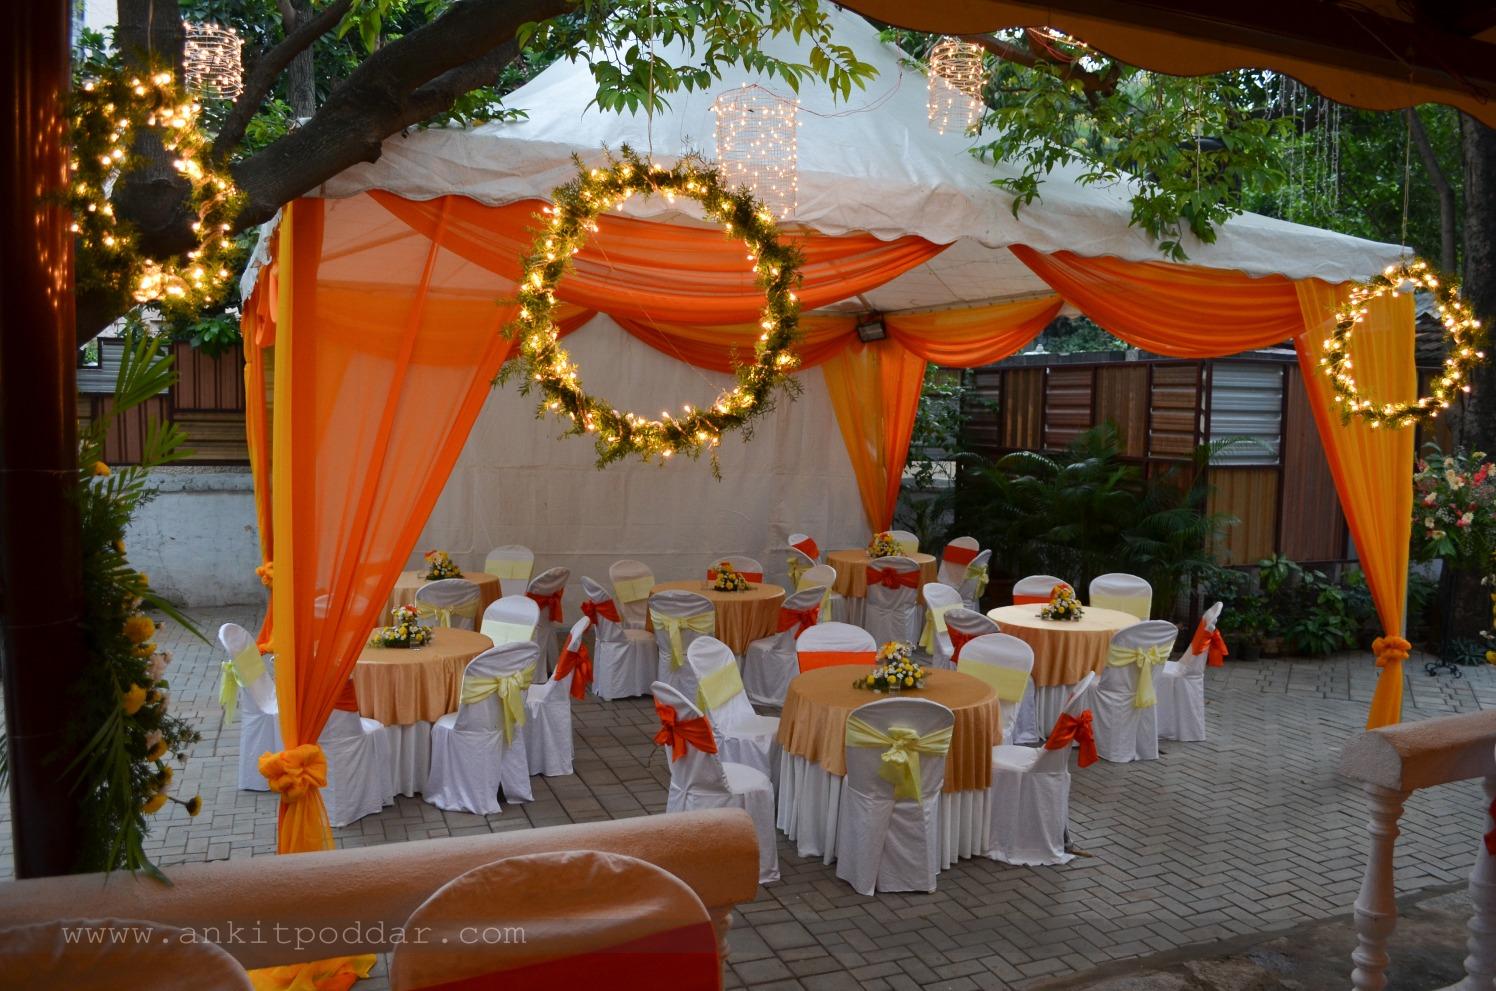 Paragon of Beauty With Fairy Light Wreath by Ankit Poddar Wedding-photography | Weddings Photos & Ideas